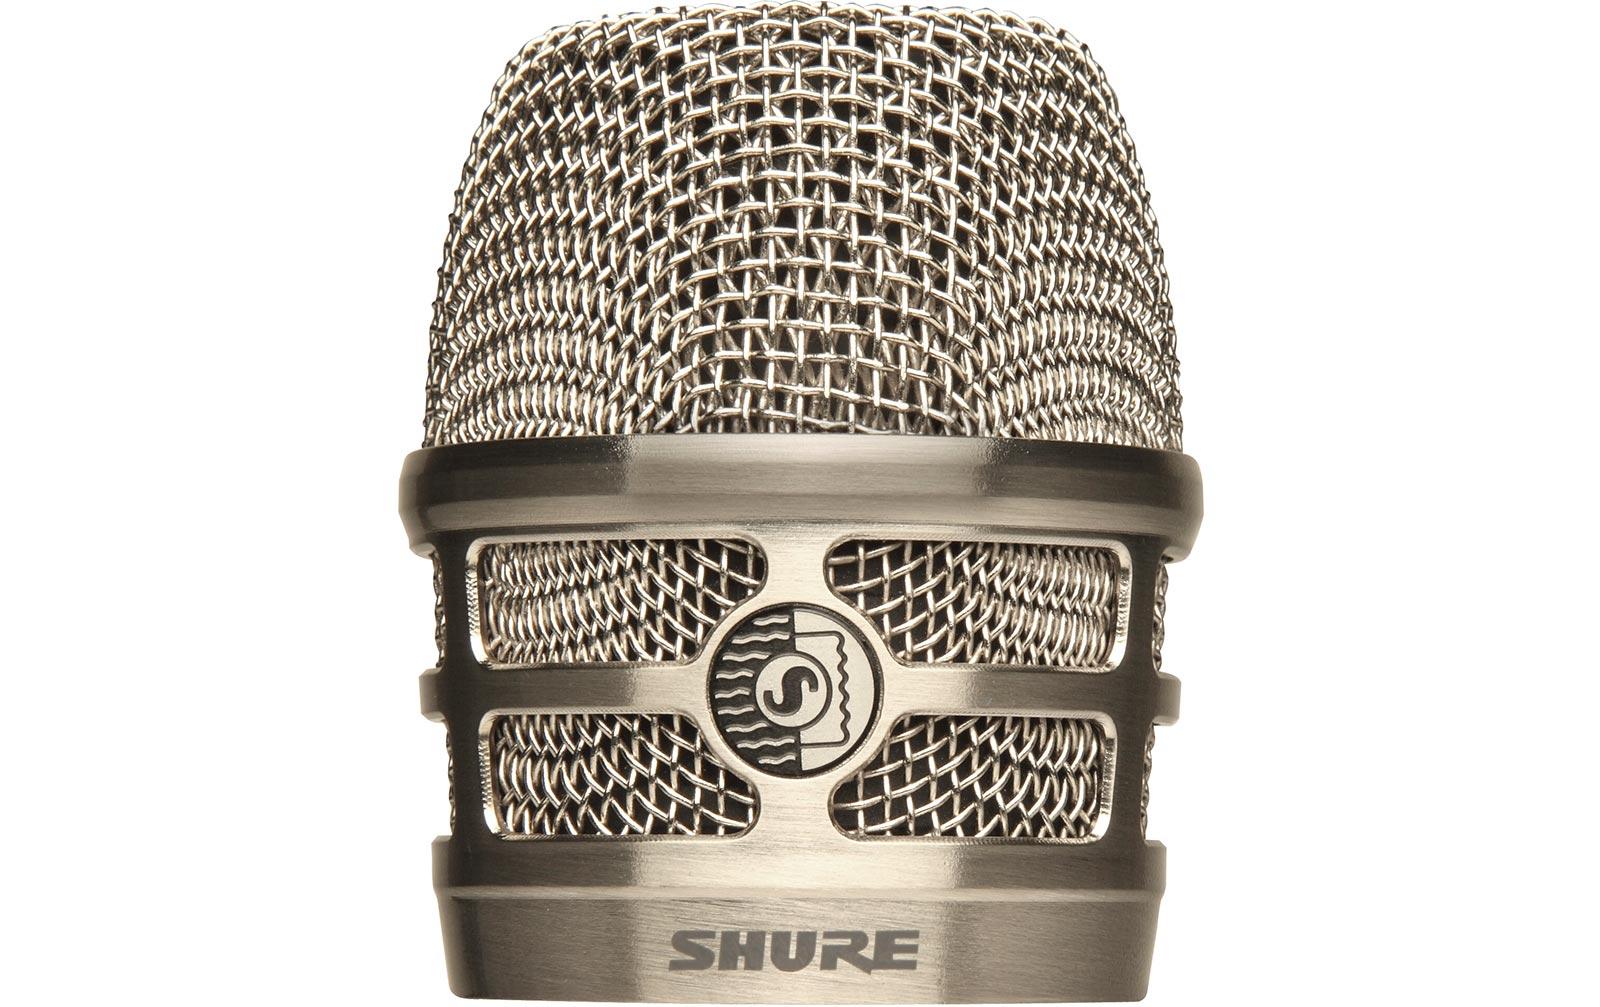 shure-rpm-268-austauschkorb-fa-r-ksm8-nickel